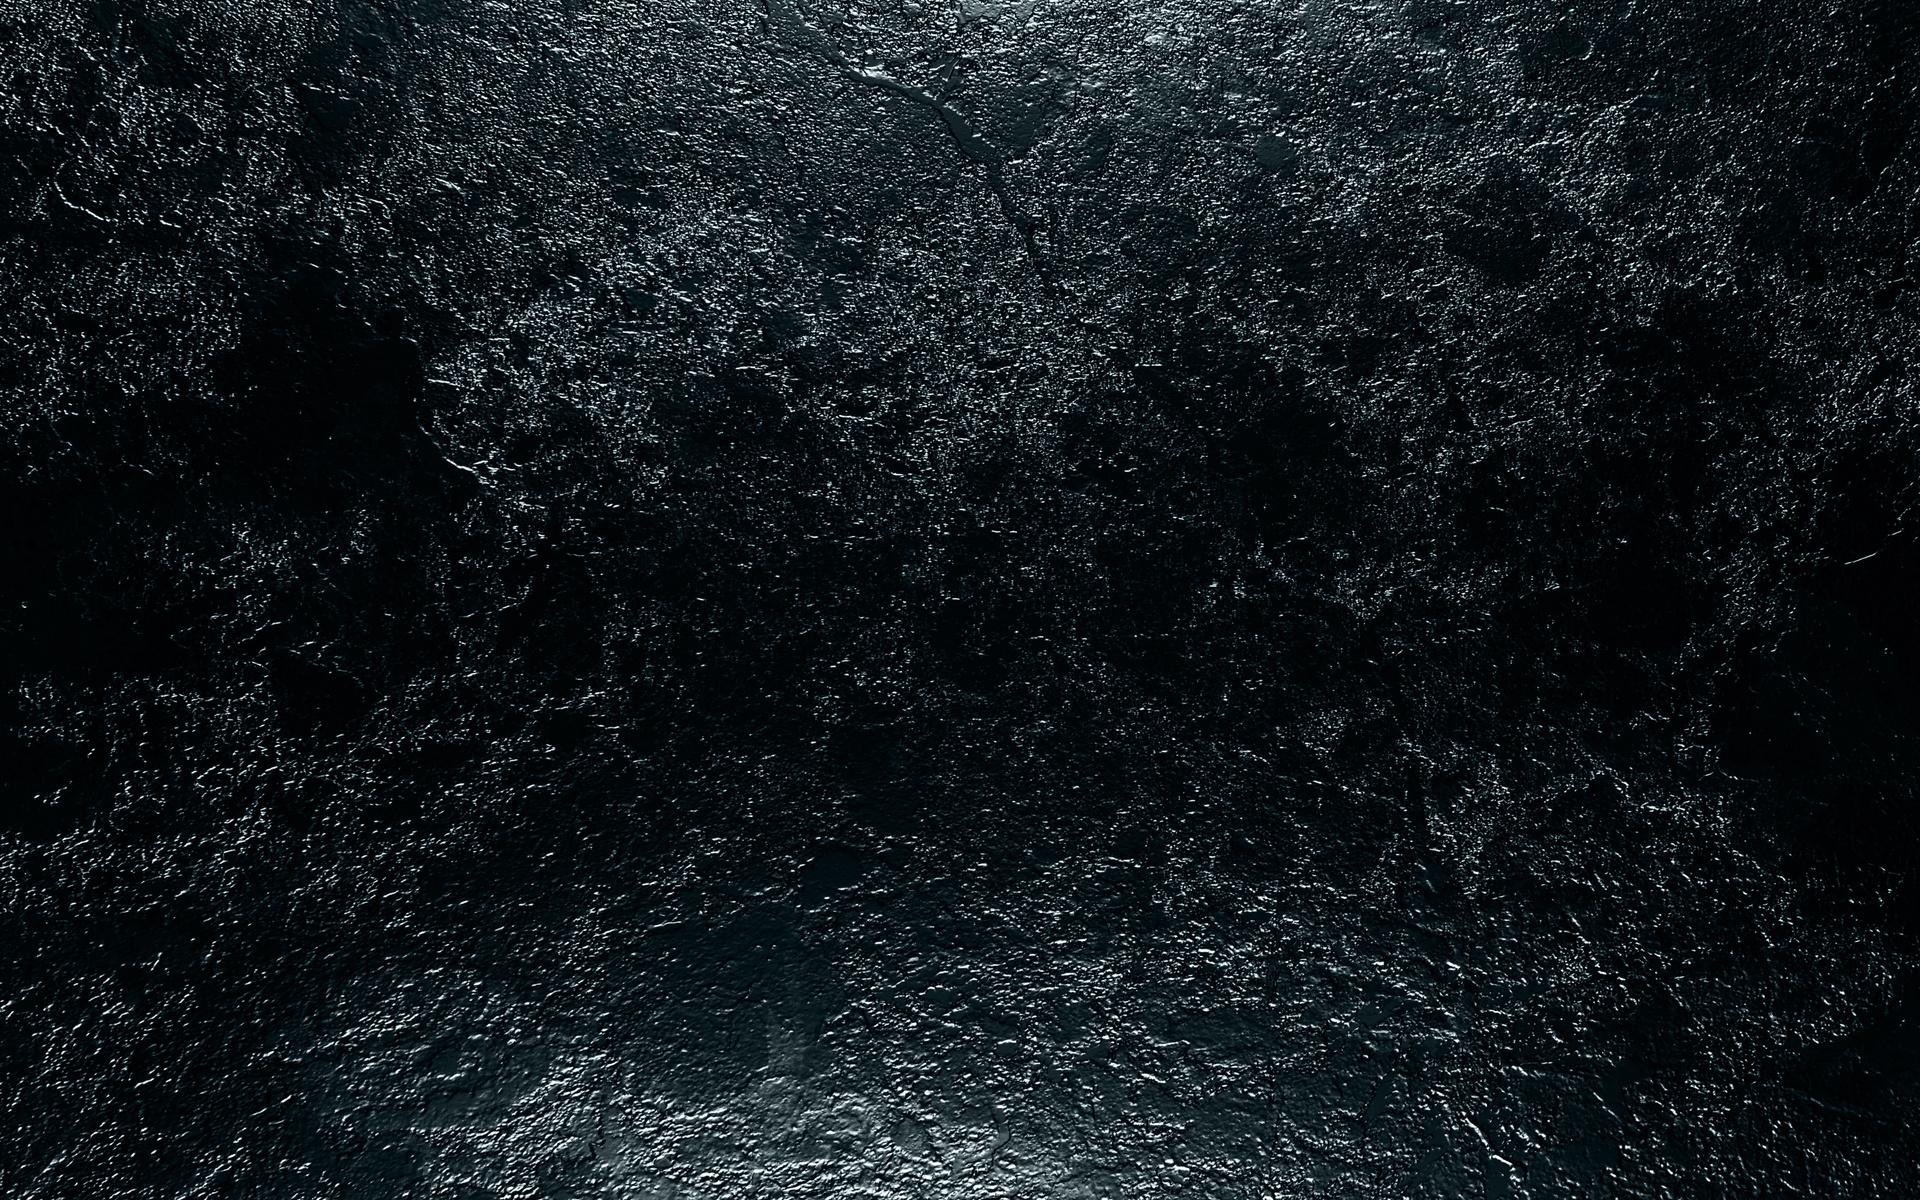 Texture metal black wallpaper 1920x1200 64790 WallpaperUP 1920x1200